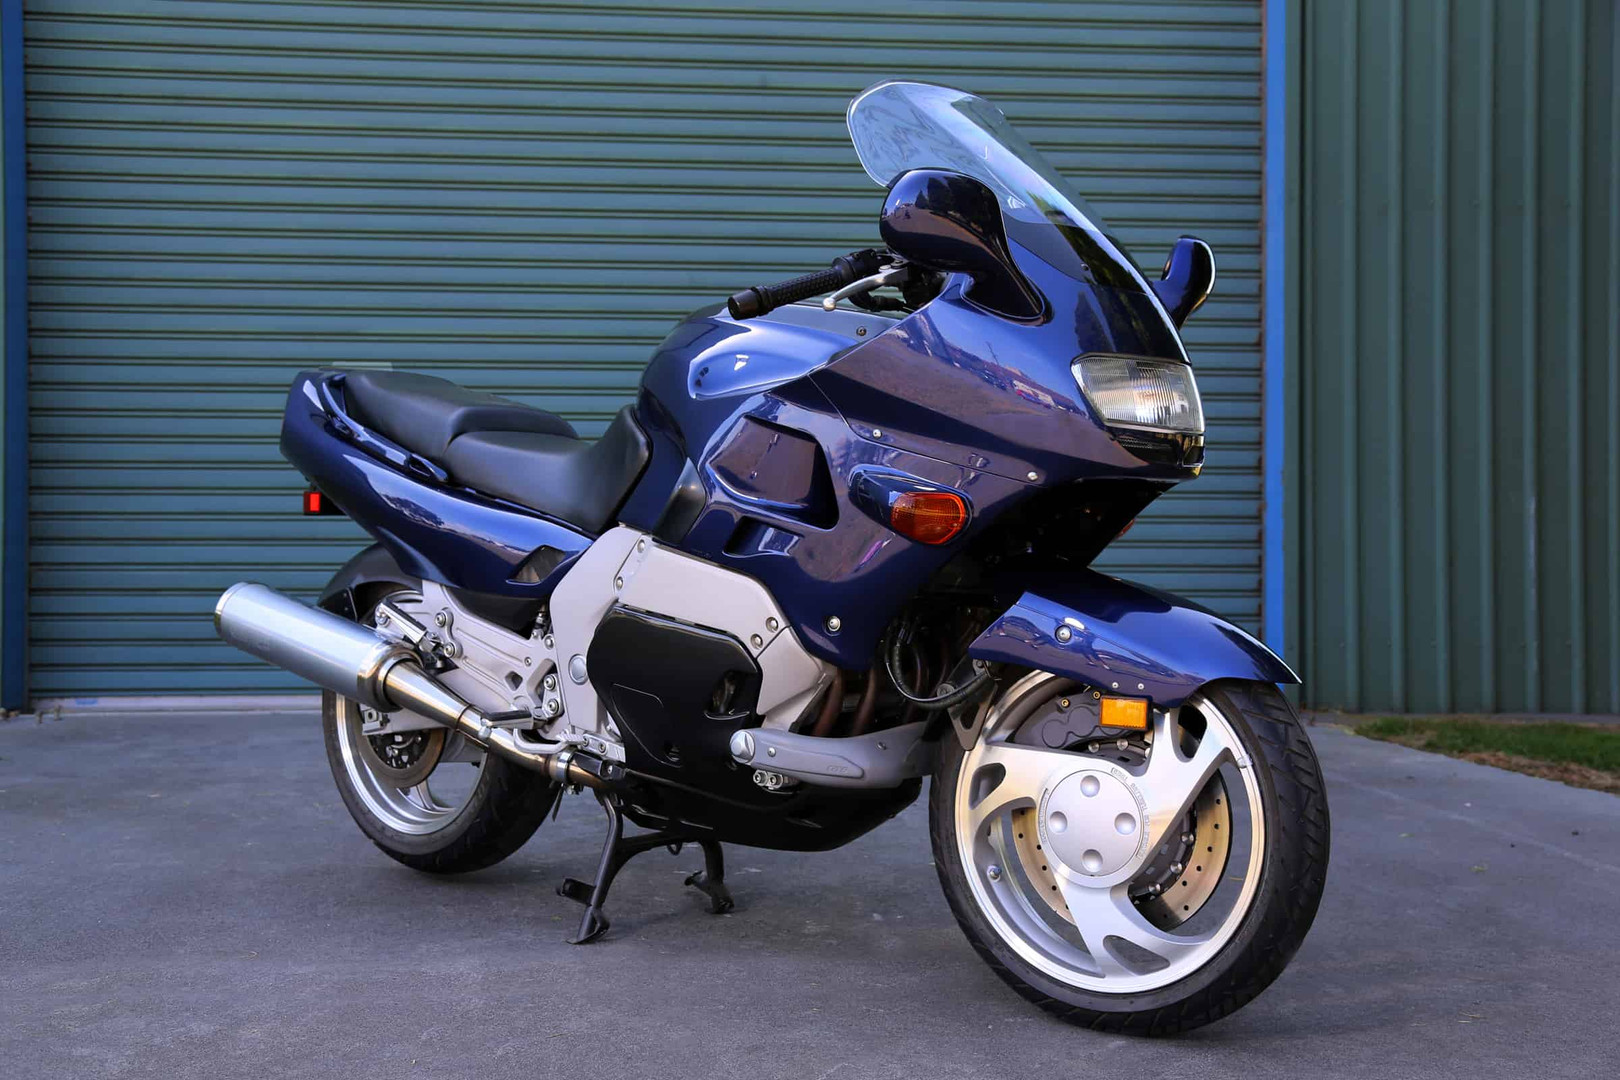 1993-Yamaha-GTS-blue-f45rs.jpg